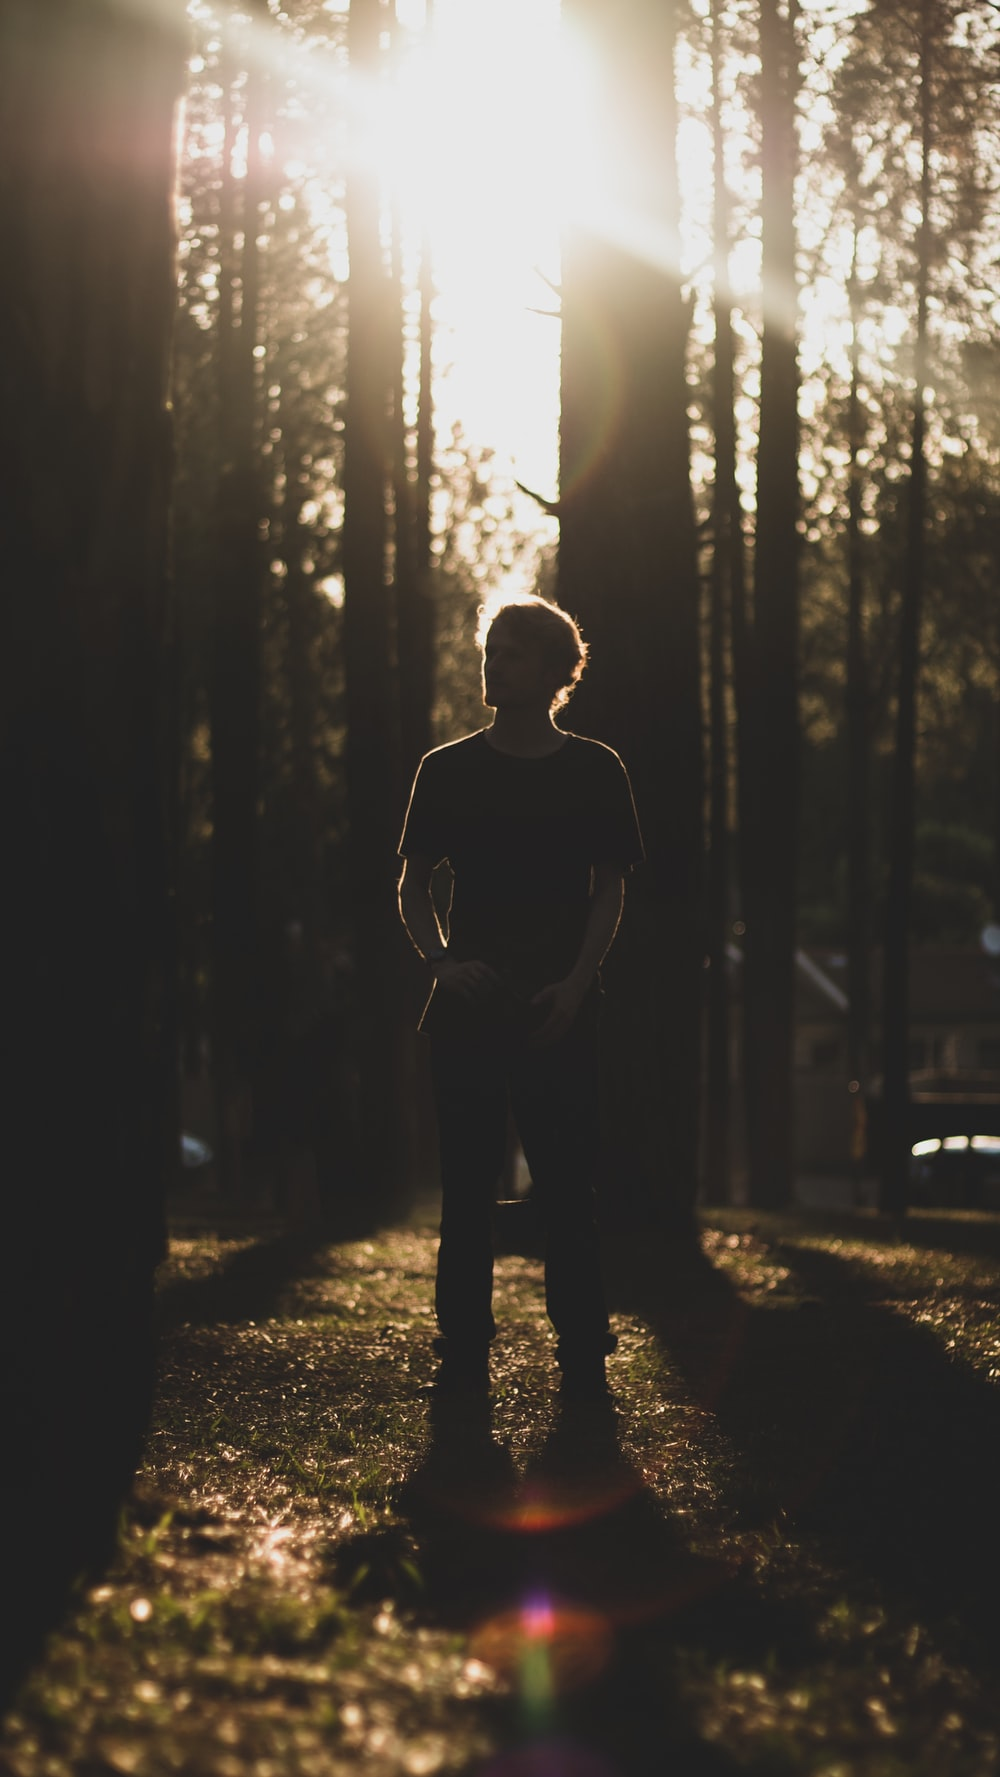 man standing under trees during daytime